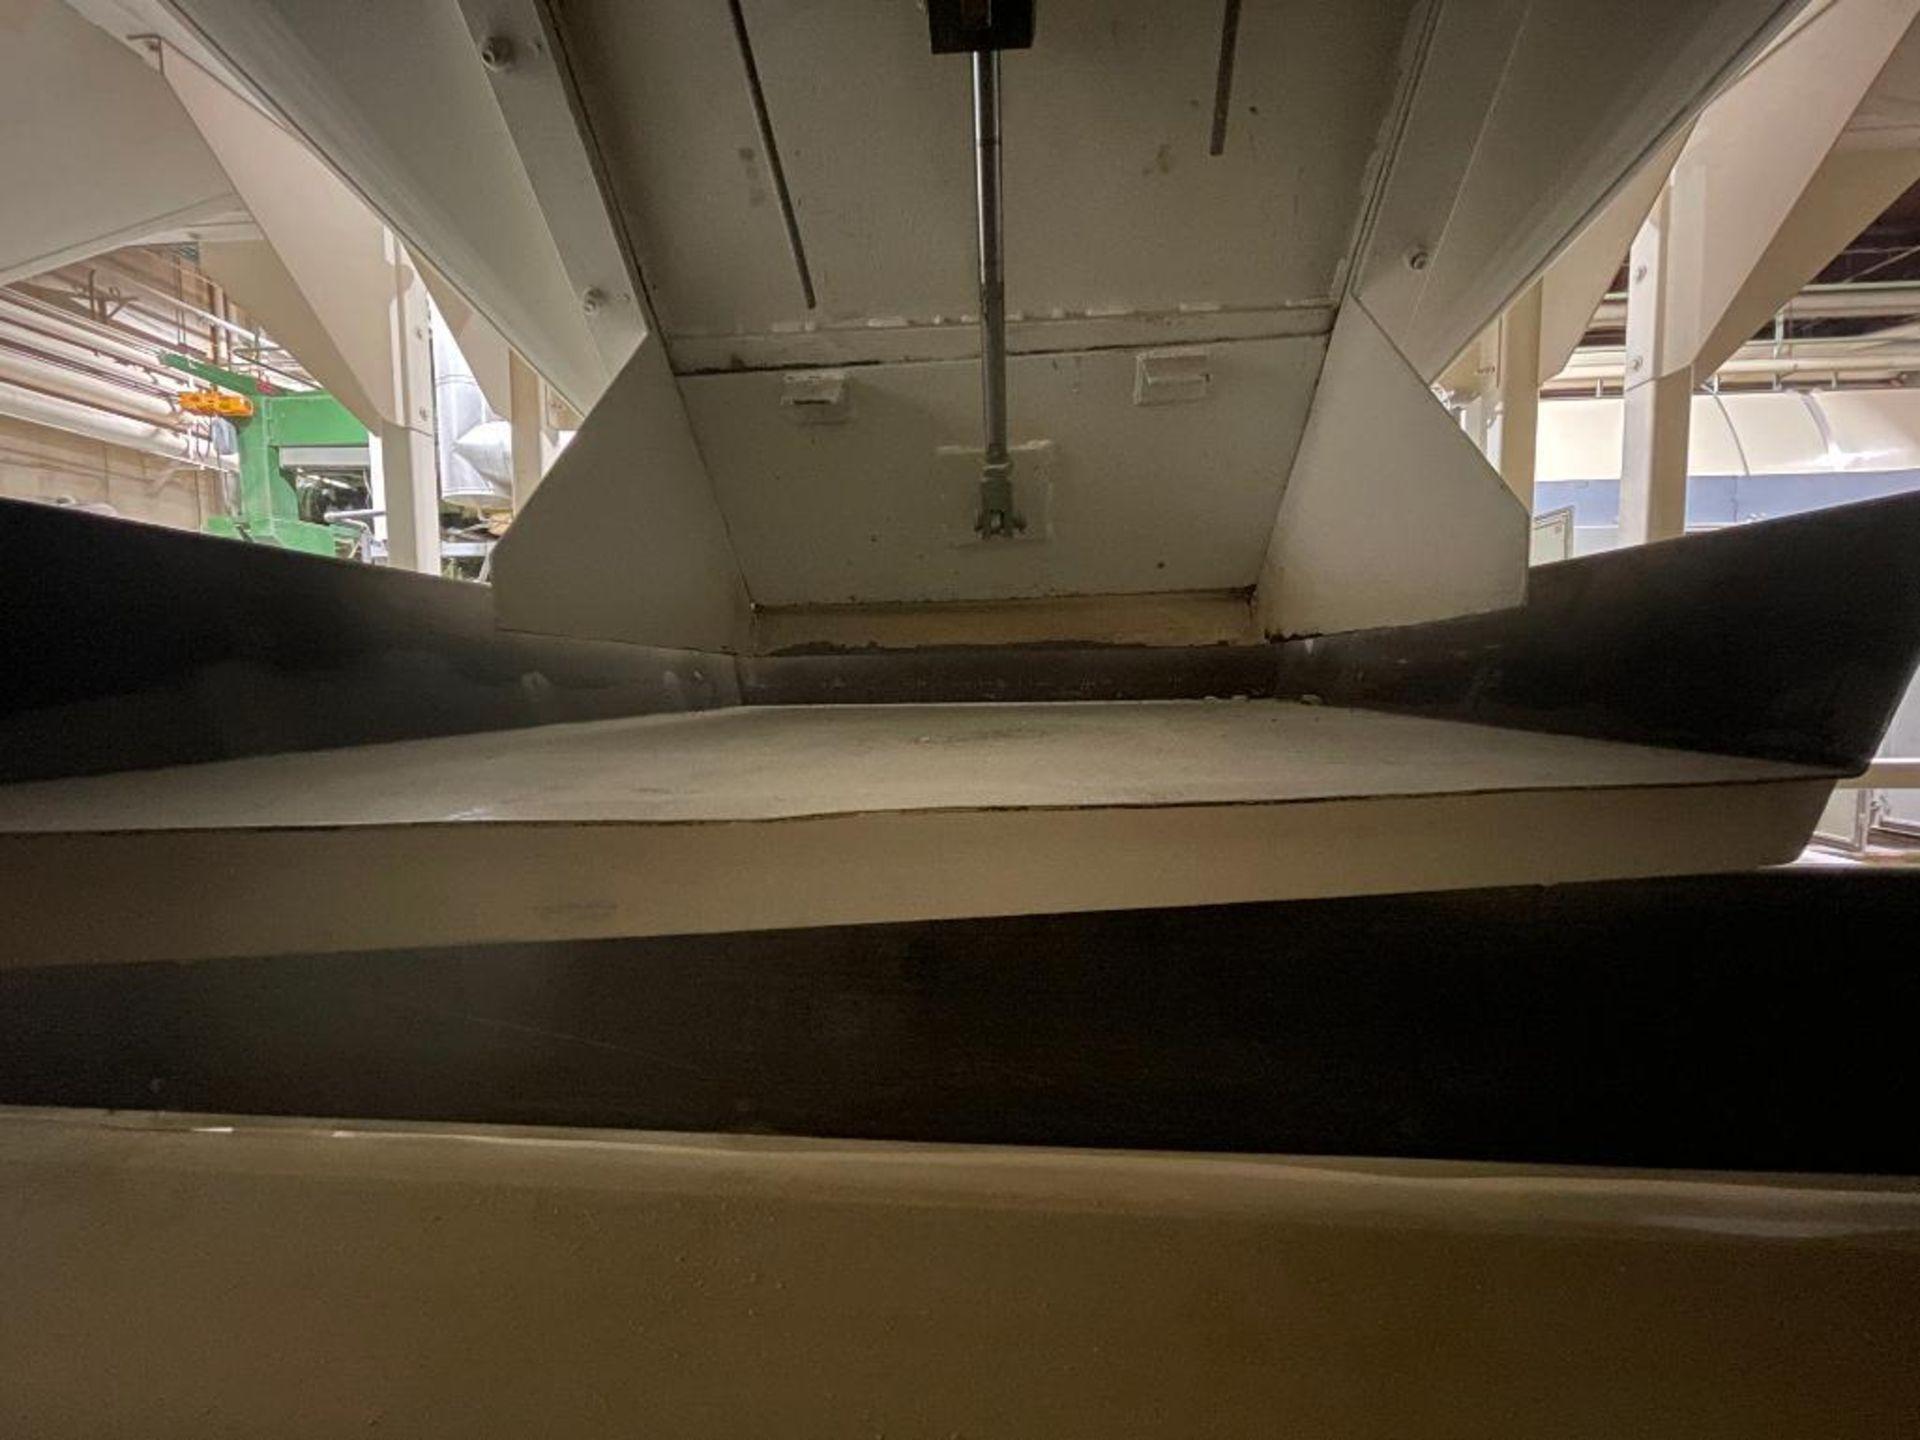 Aseeco mild steel cone bottom bulk storage bin - Image 19 of 31